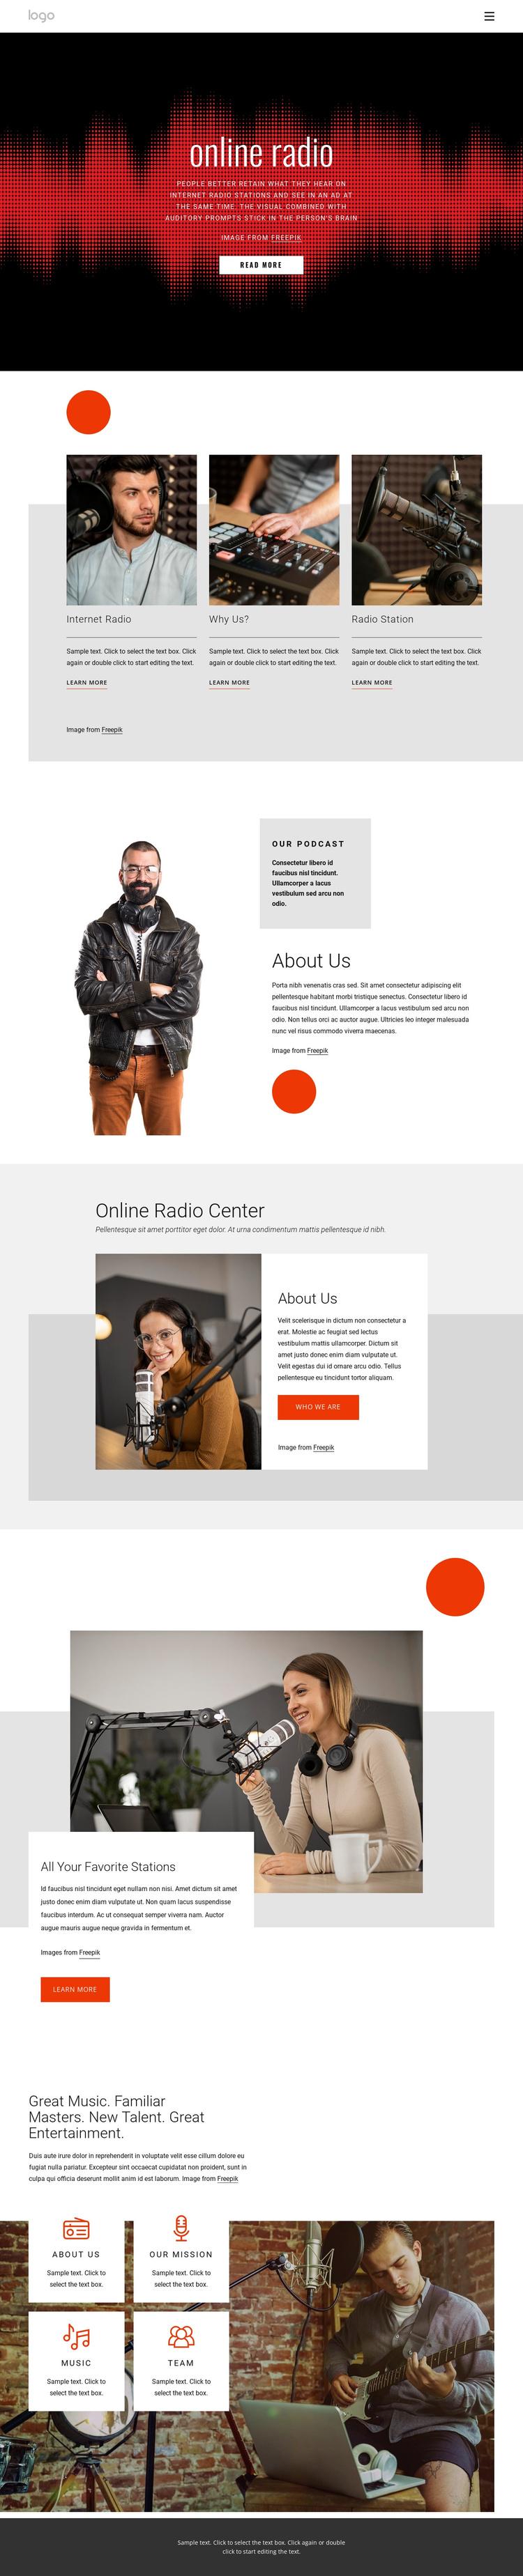 Online radio shows Joomla Template